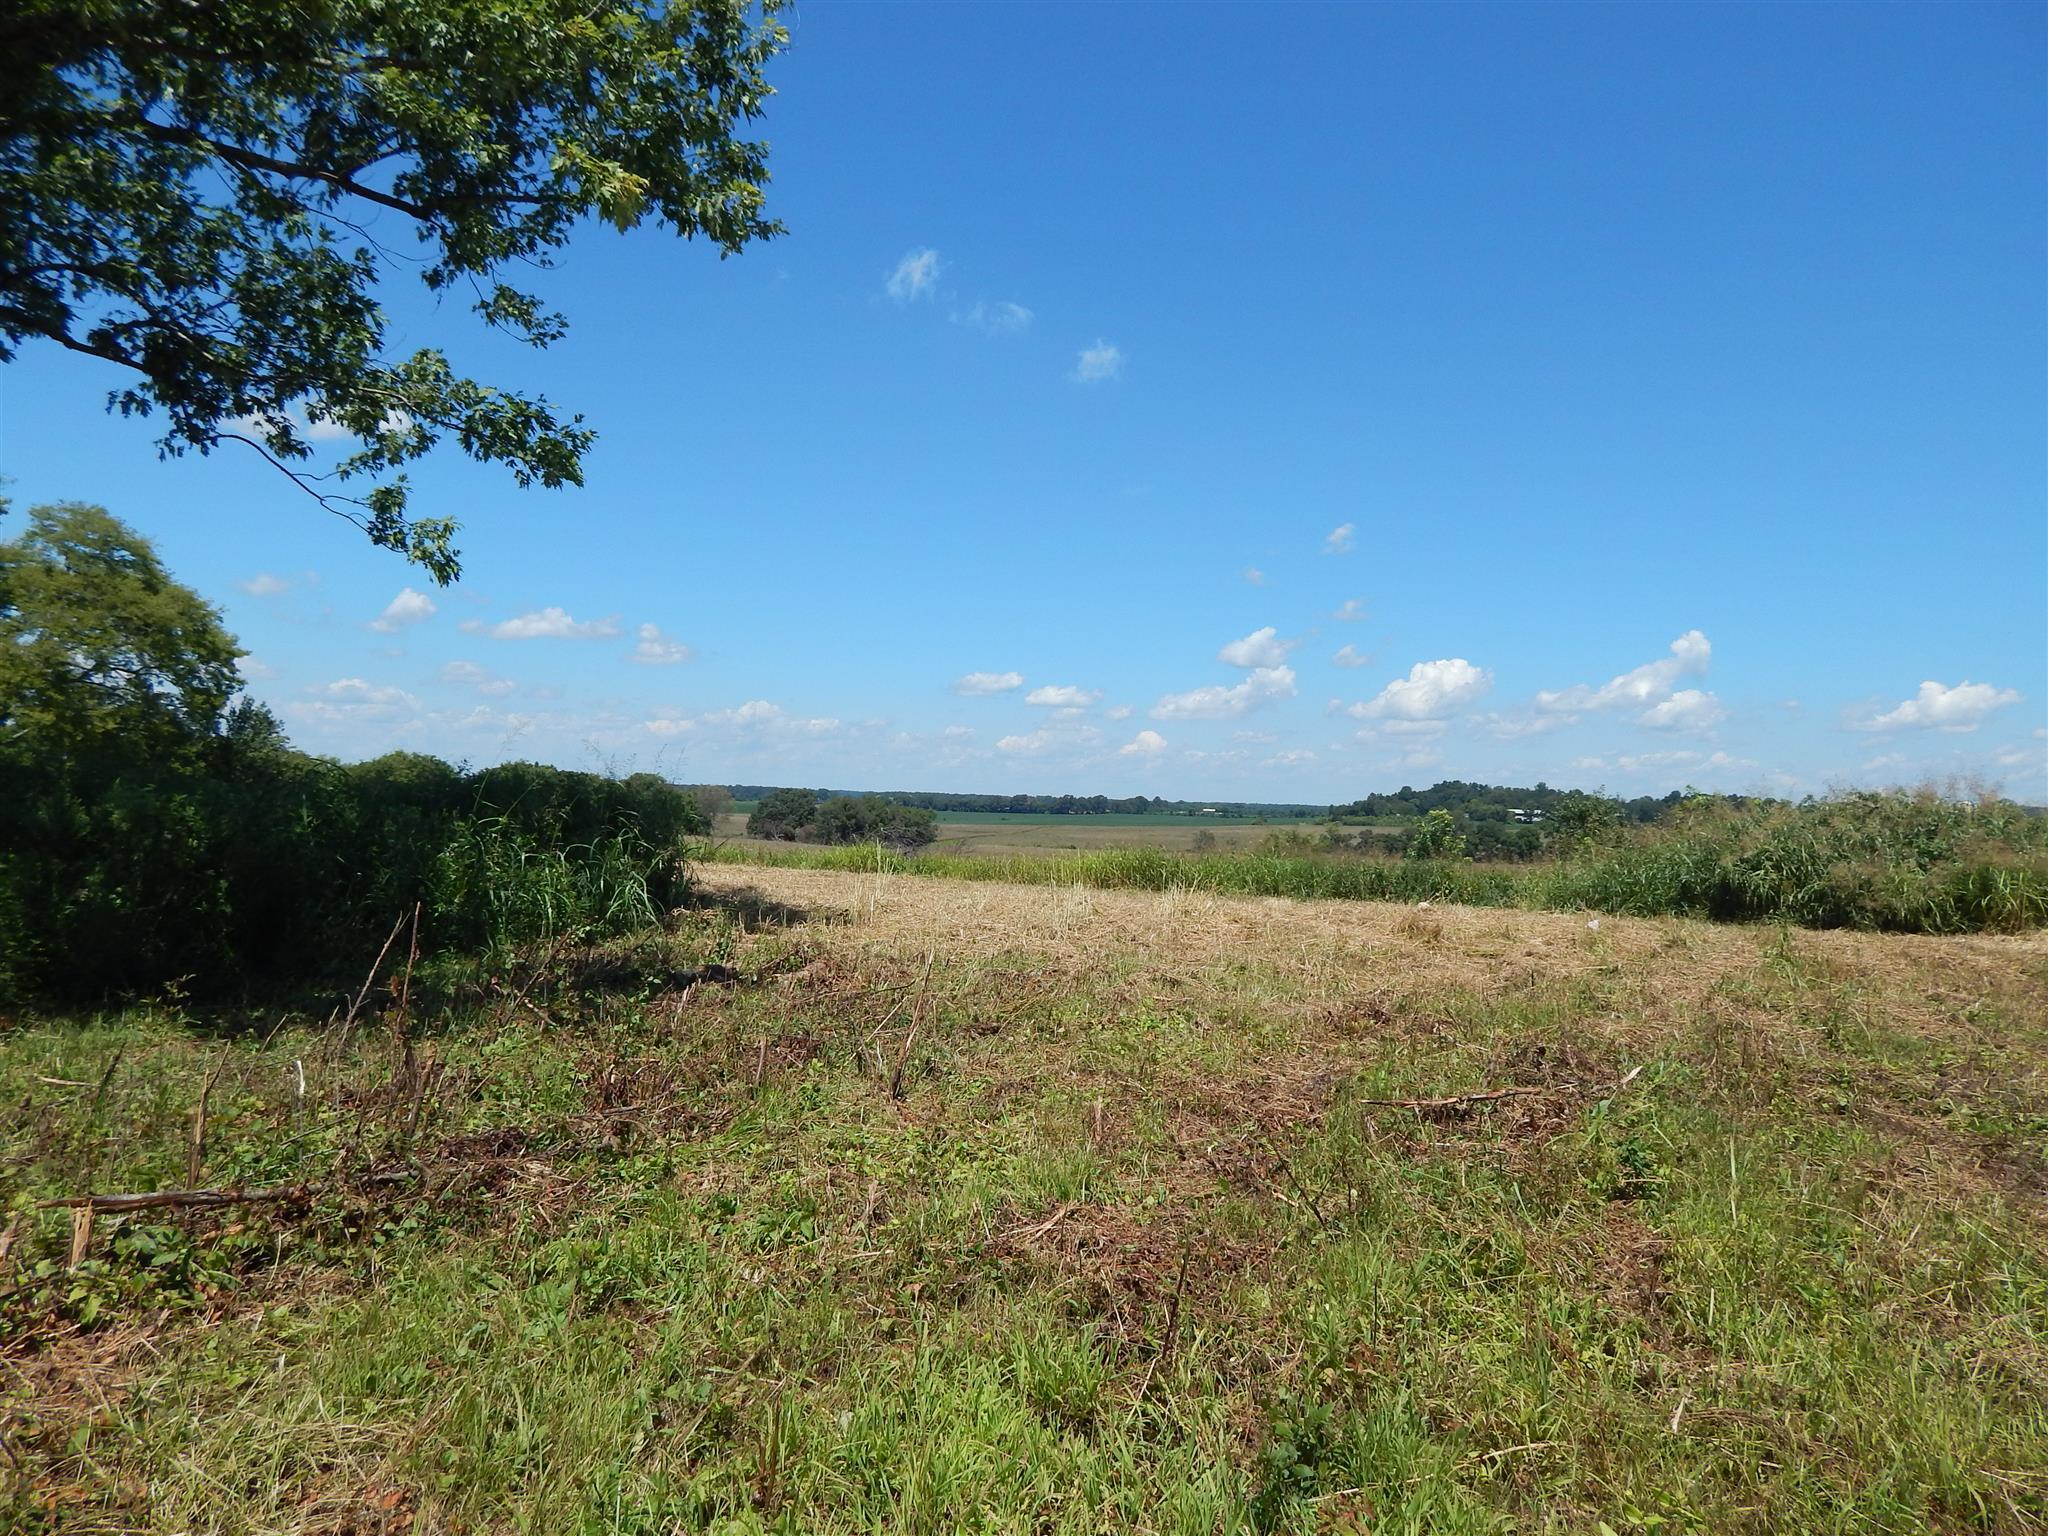 0 KENTUCK LANE, Belvidere, TN 37306 - Belvidere, TN real estate listing